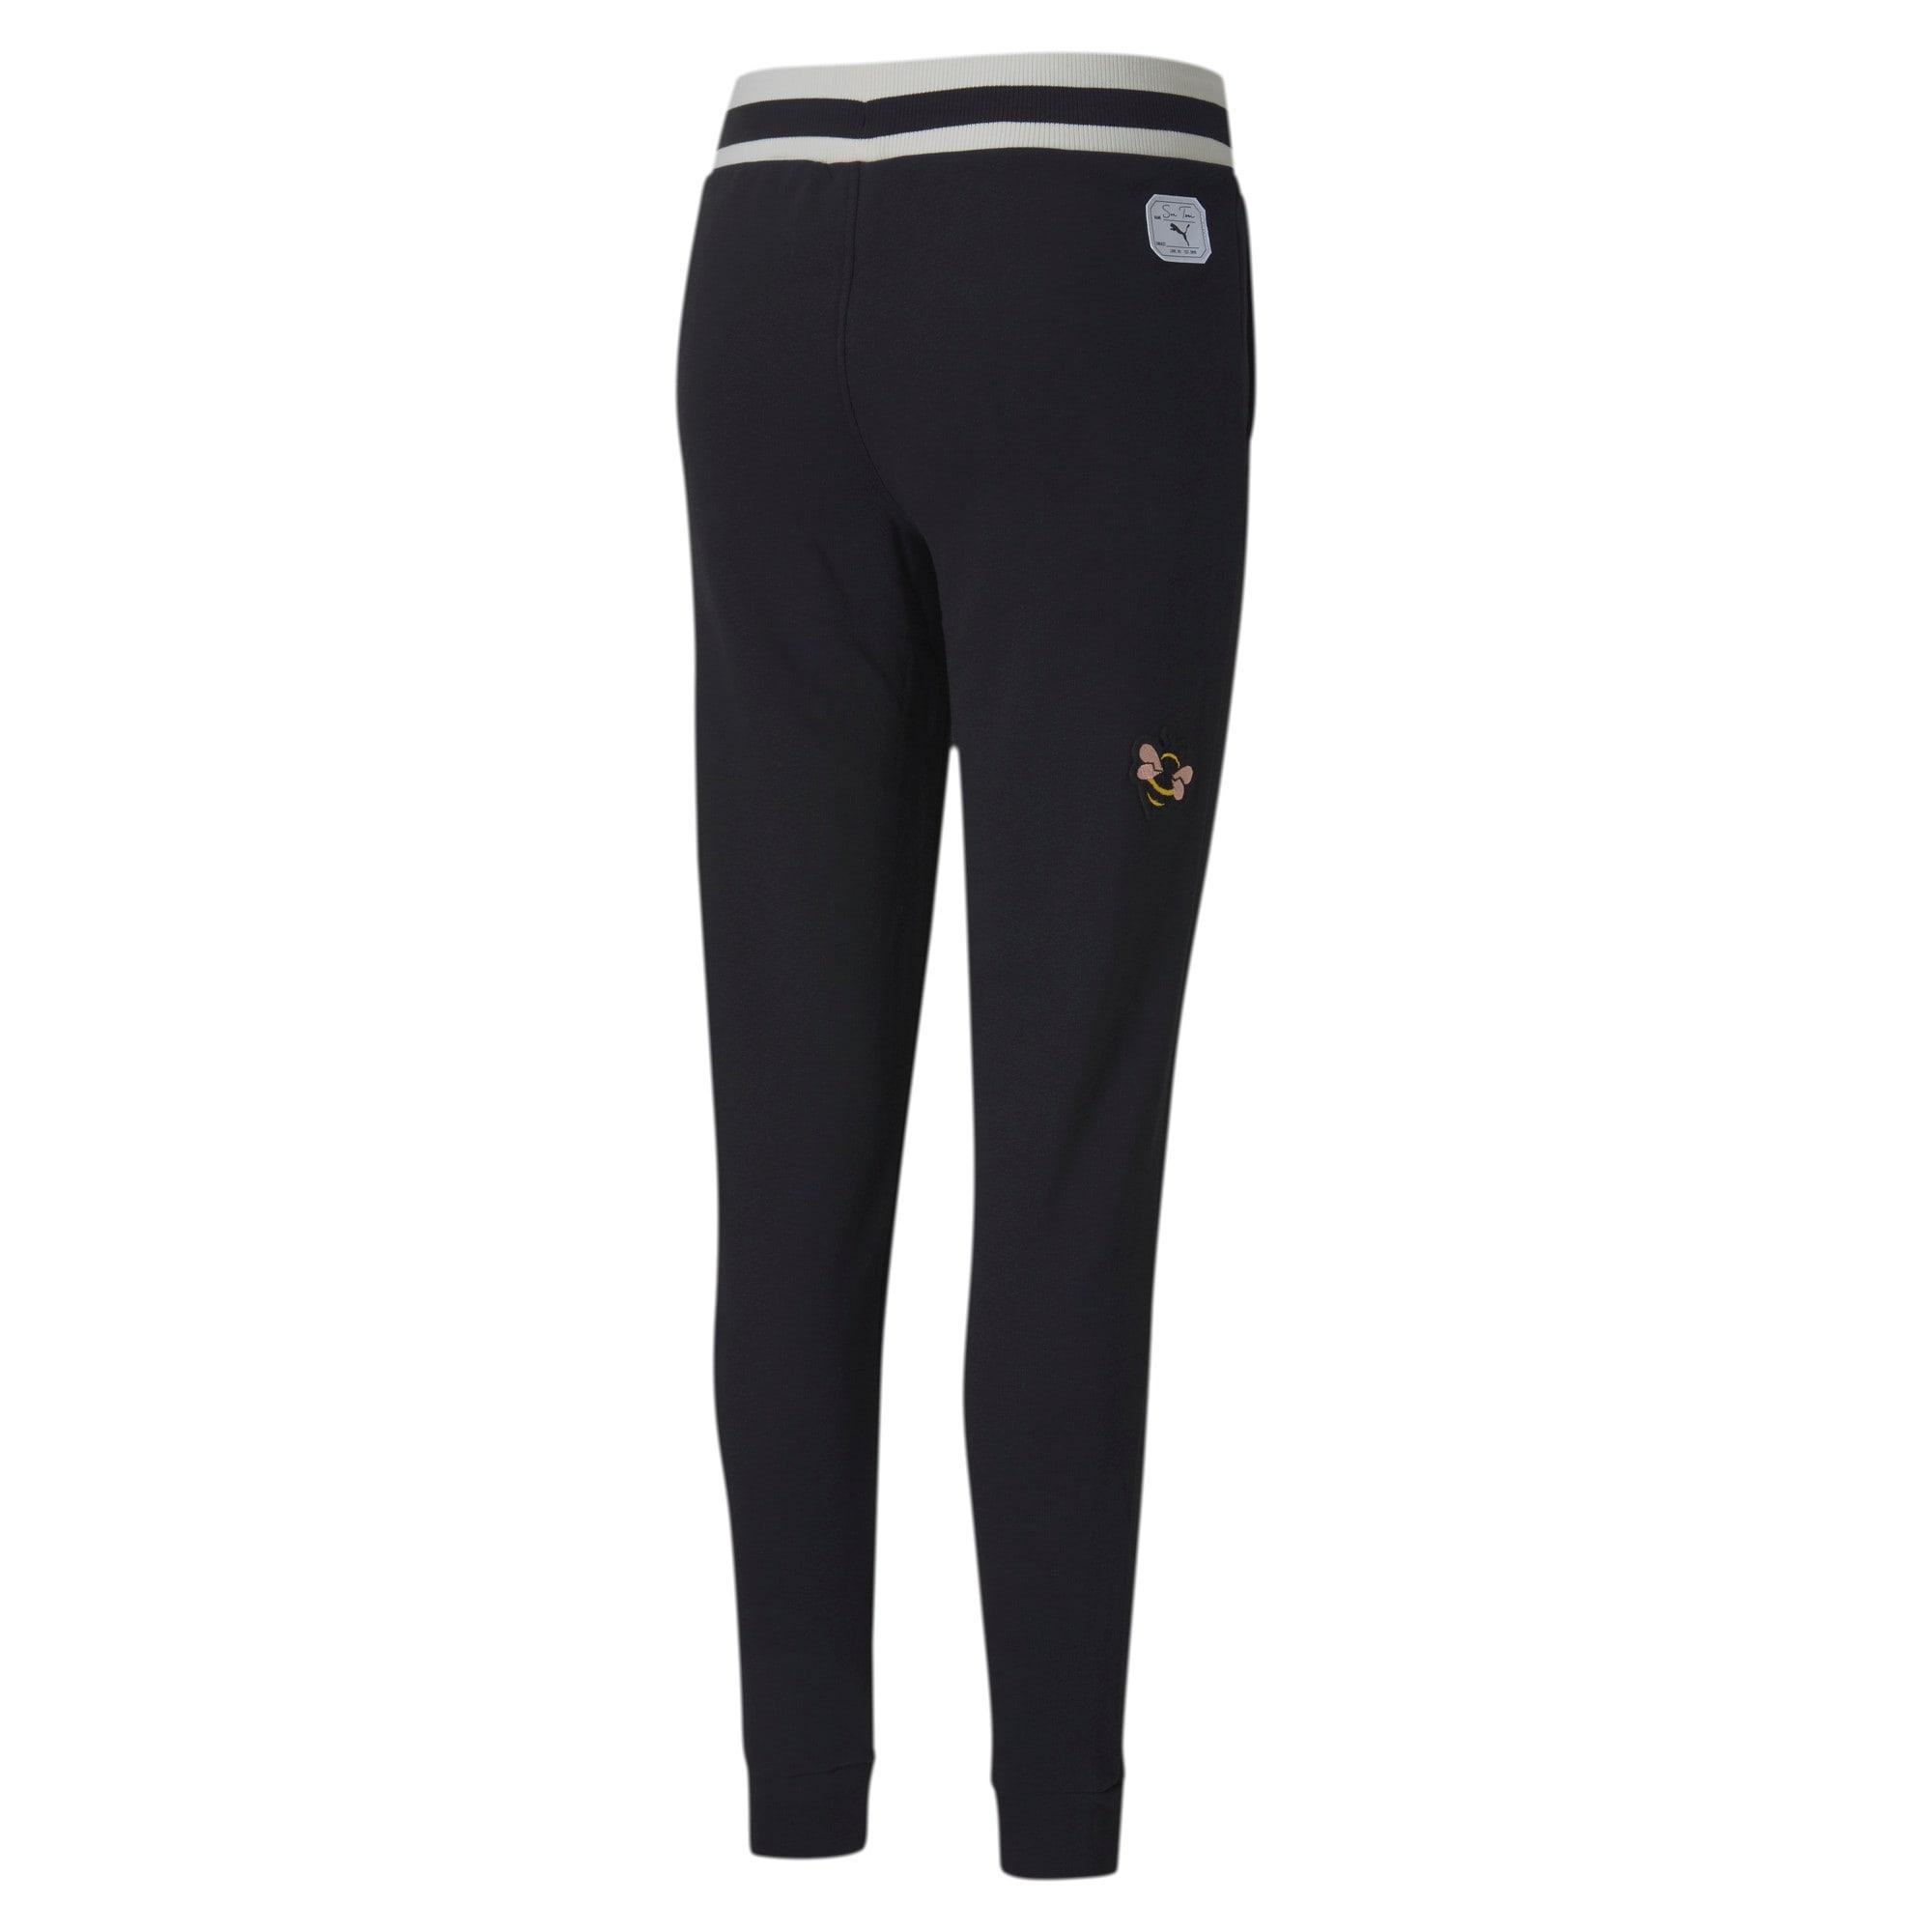 Thumbnail 1 of PUMA x SUE TSAI Women's Sweatpants, Puma Black, medium